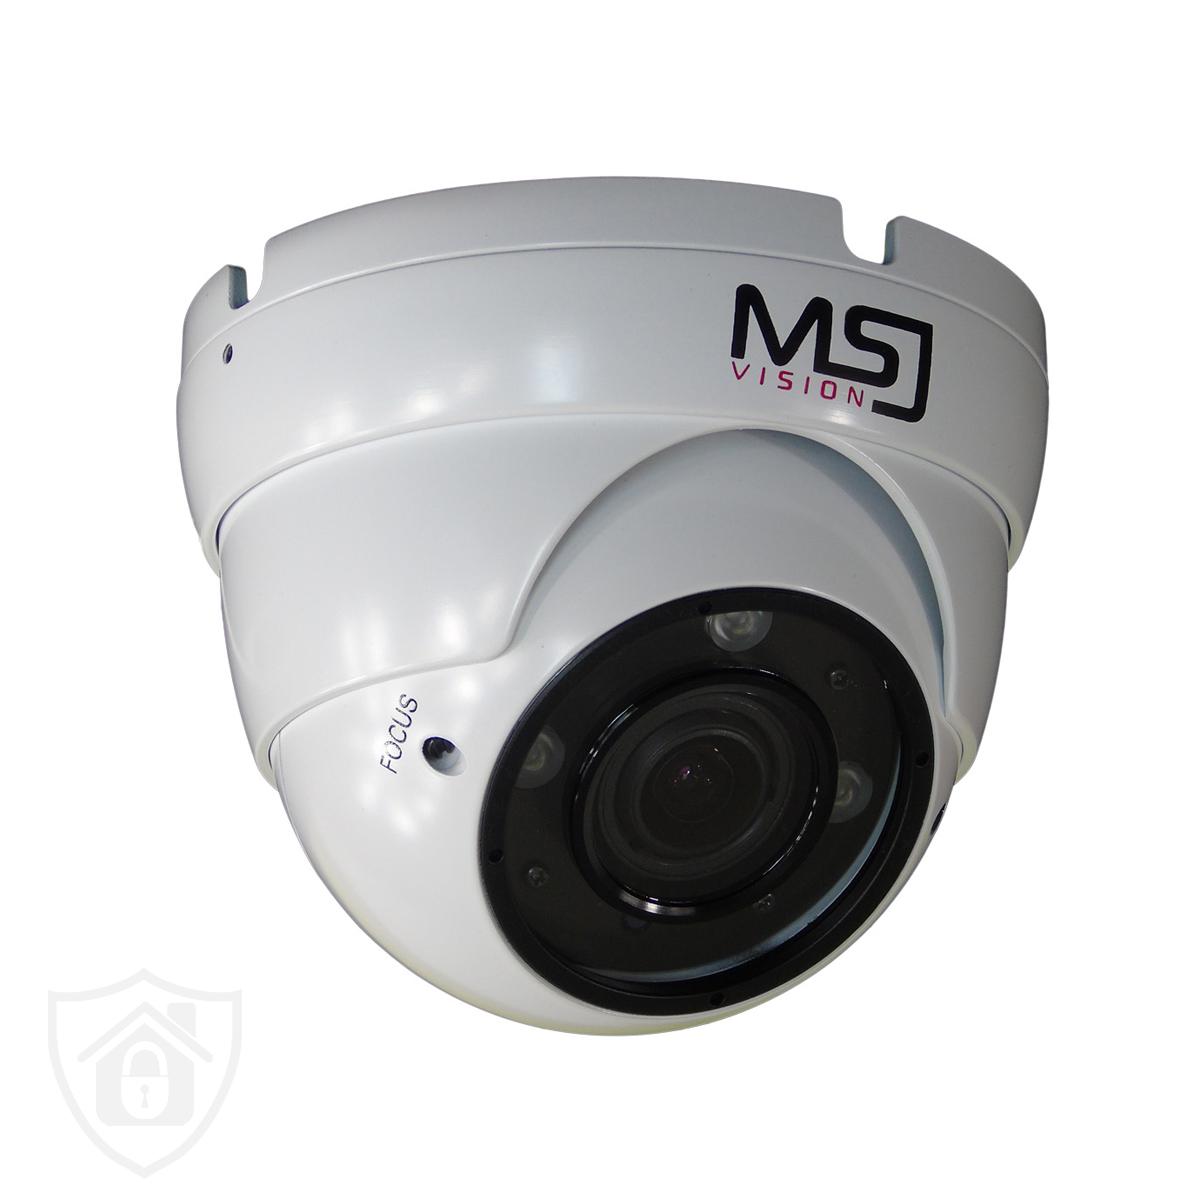 MSJ-HBR-6403G/W-AL 4MP